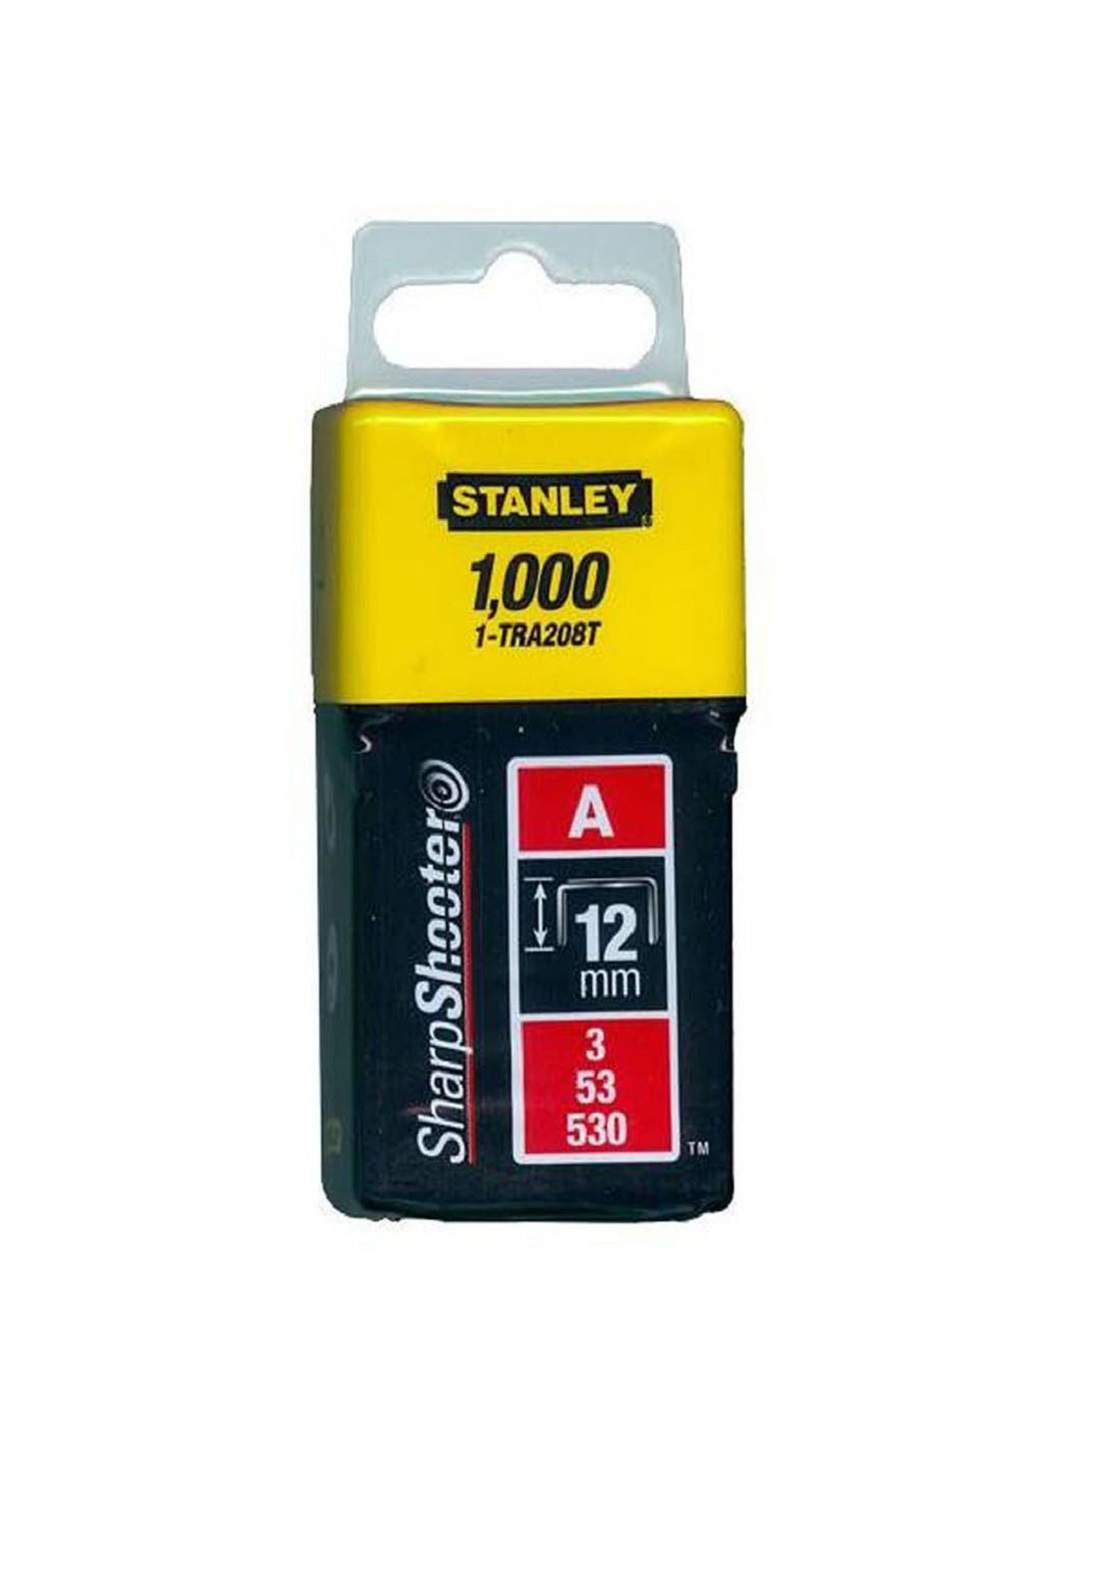 Stanley 1-TRA208T Light Duty Staples 12mm كلبسات